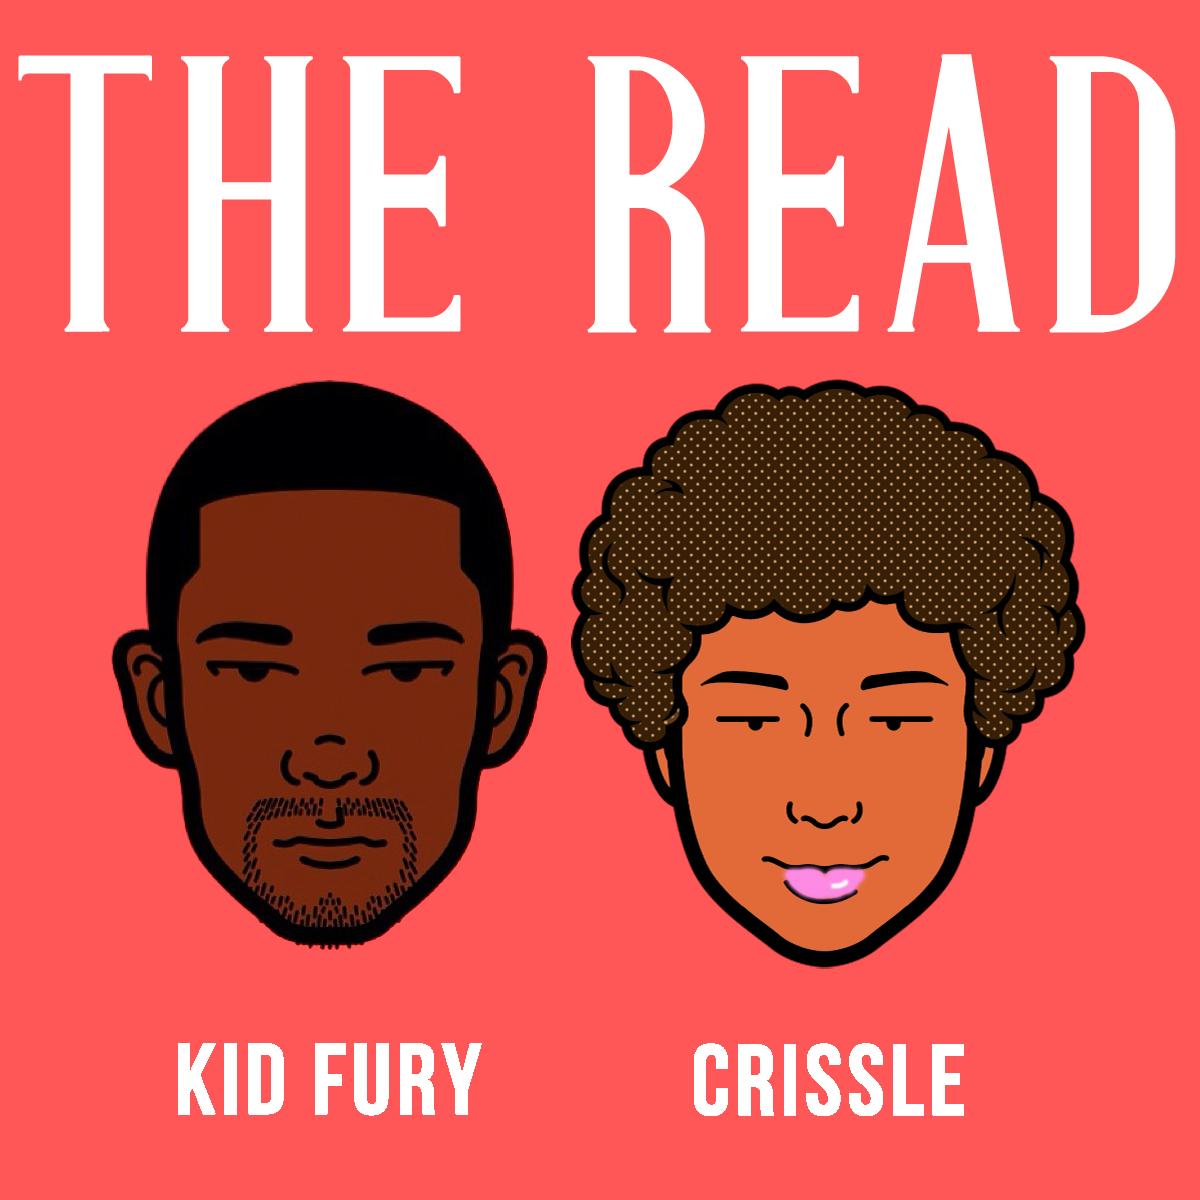 Endgame of Reads